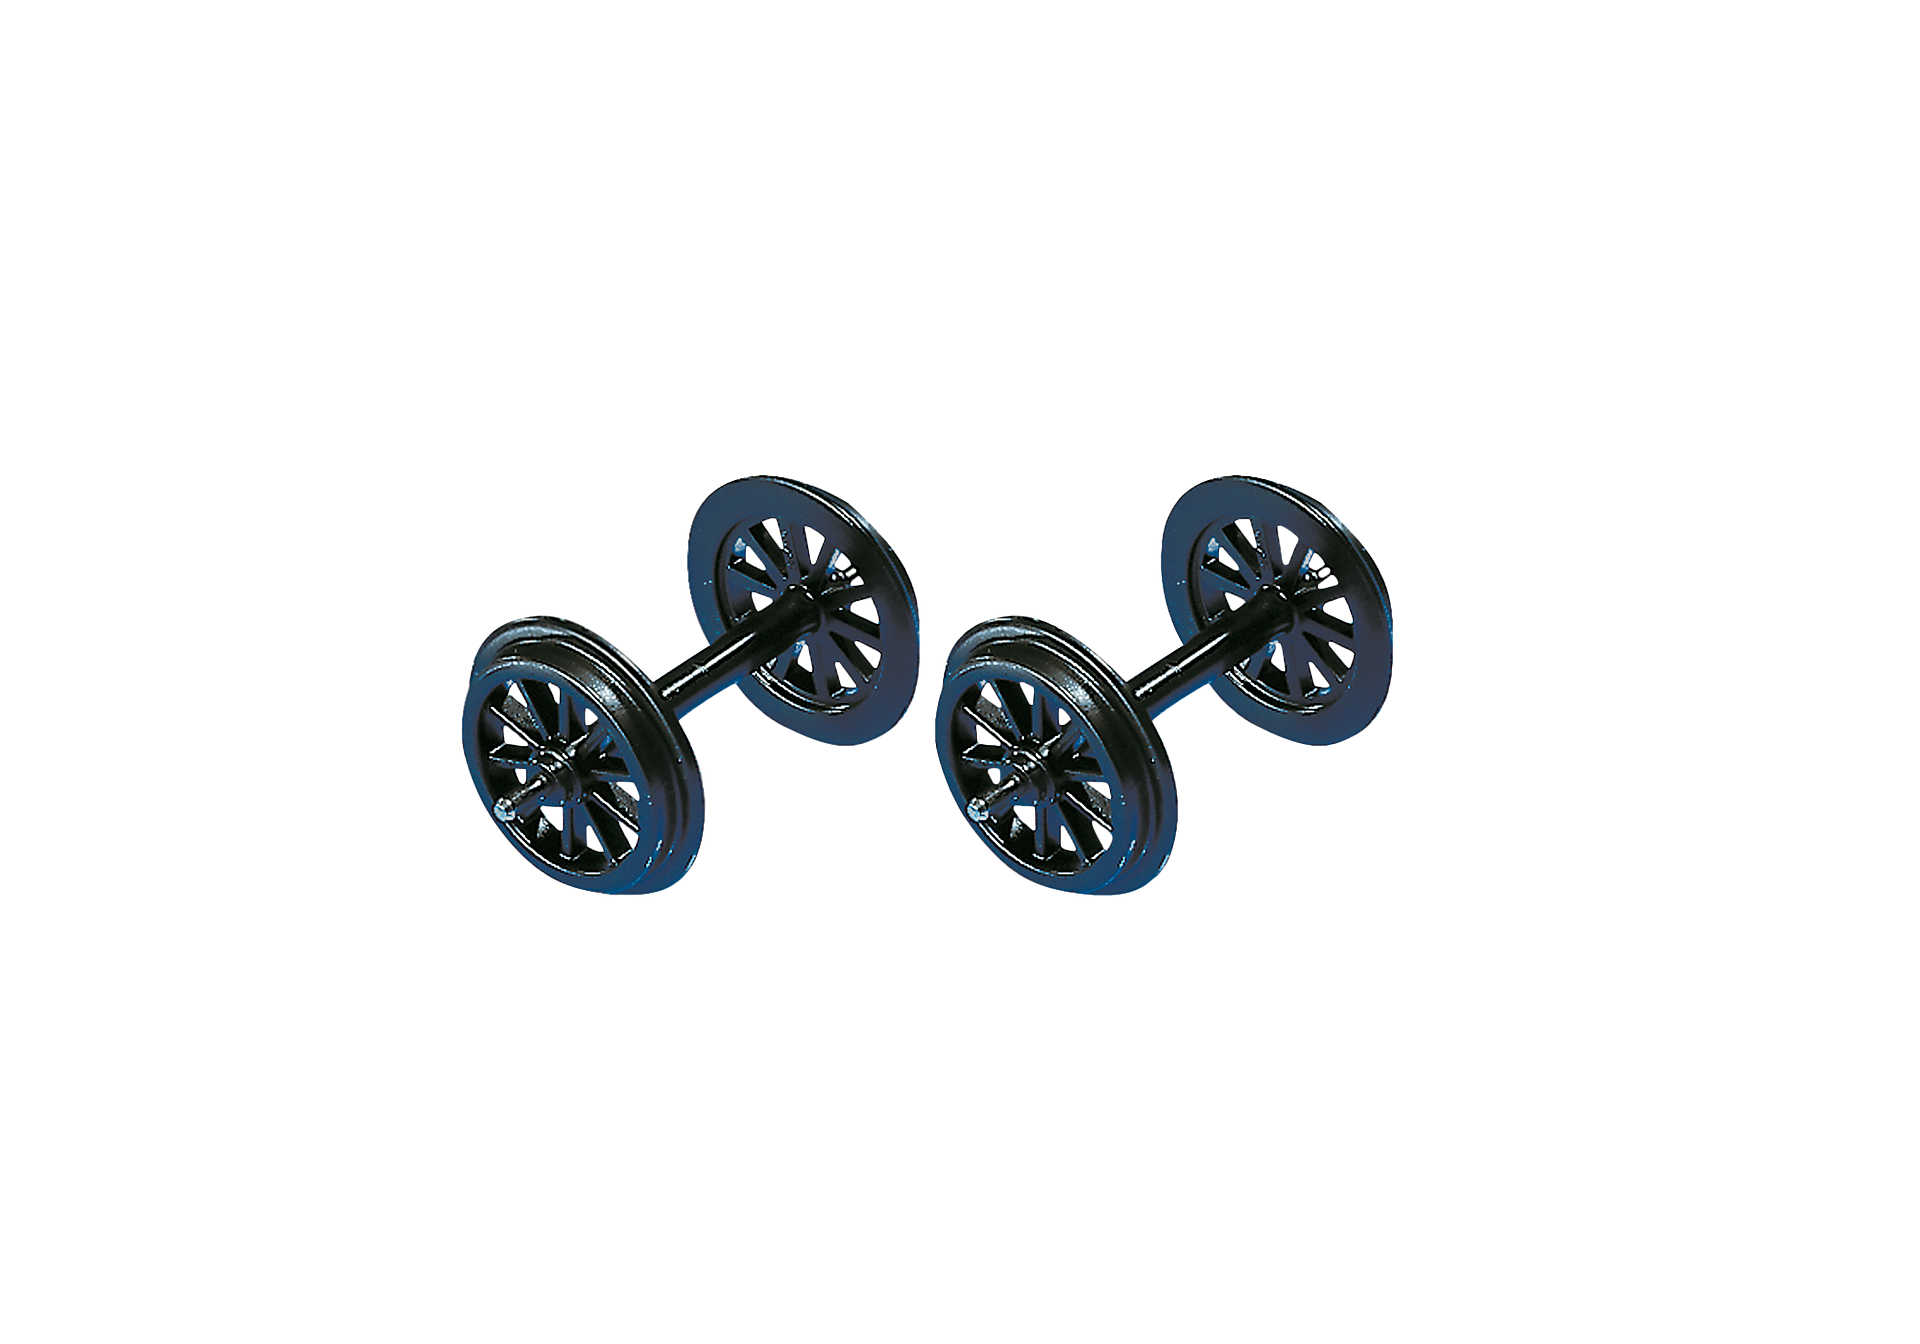 http://media.playmobil.com/i/playmobil/7553_product_detail/2 Ersatz-Achsen